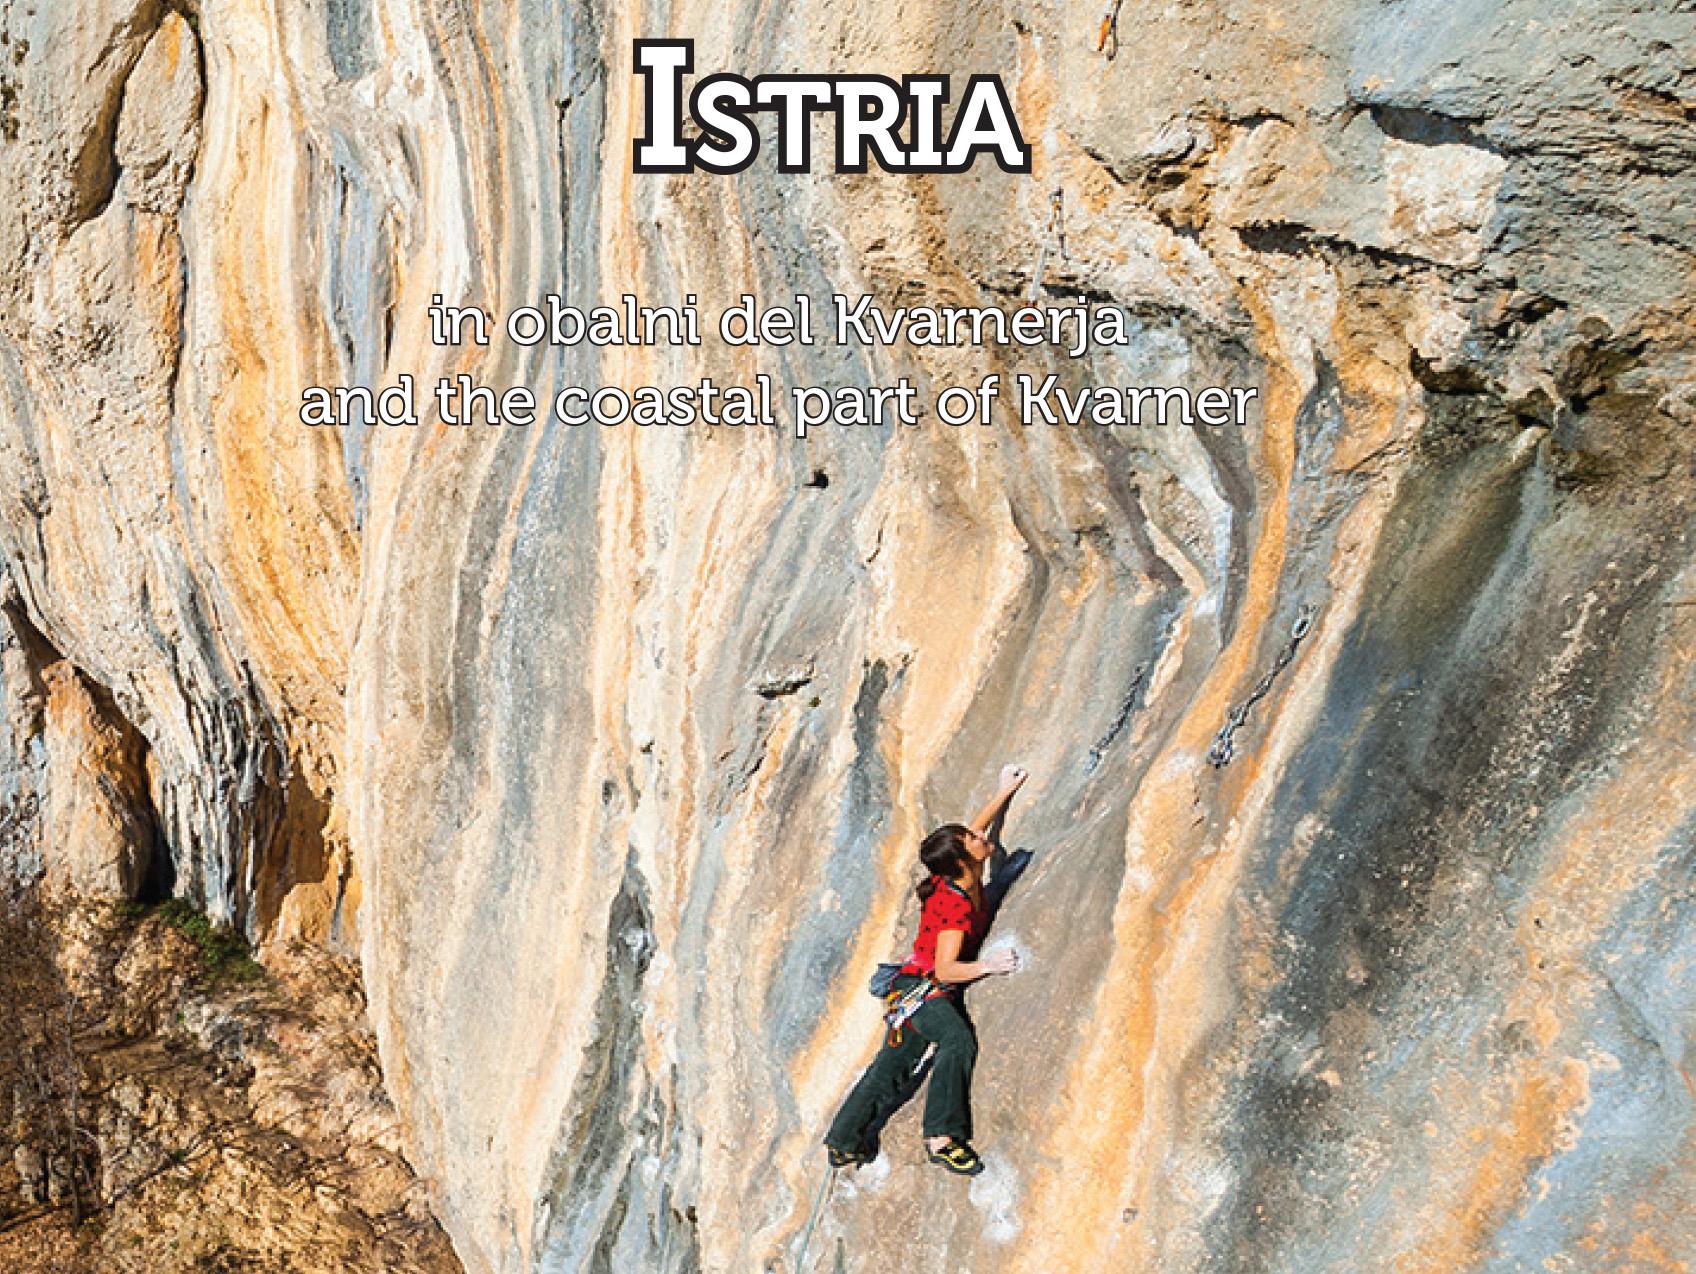 Climbing guidebook Istria